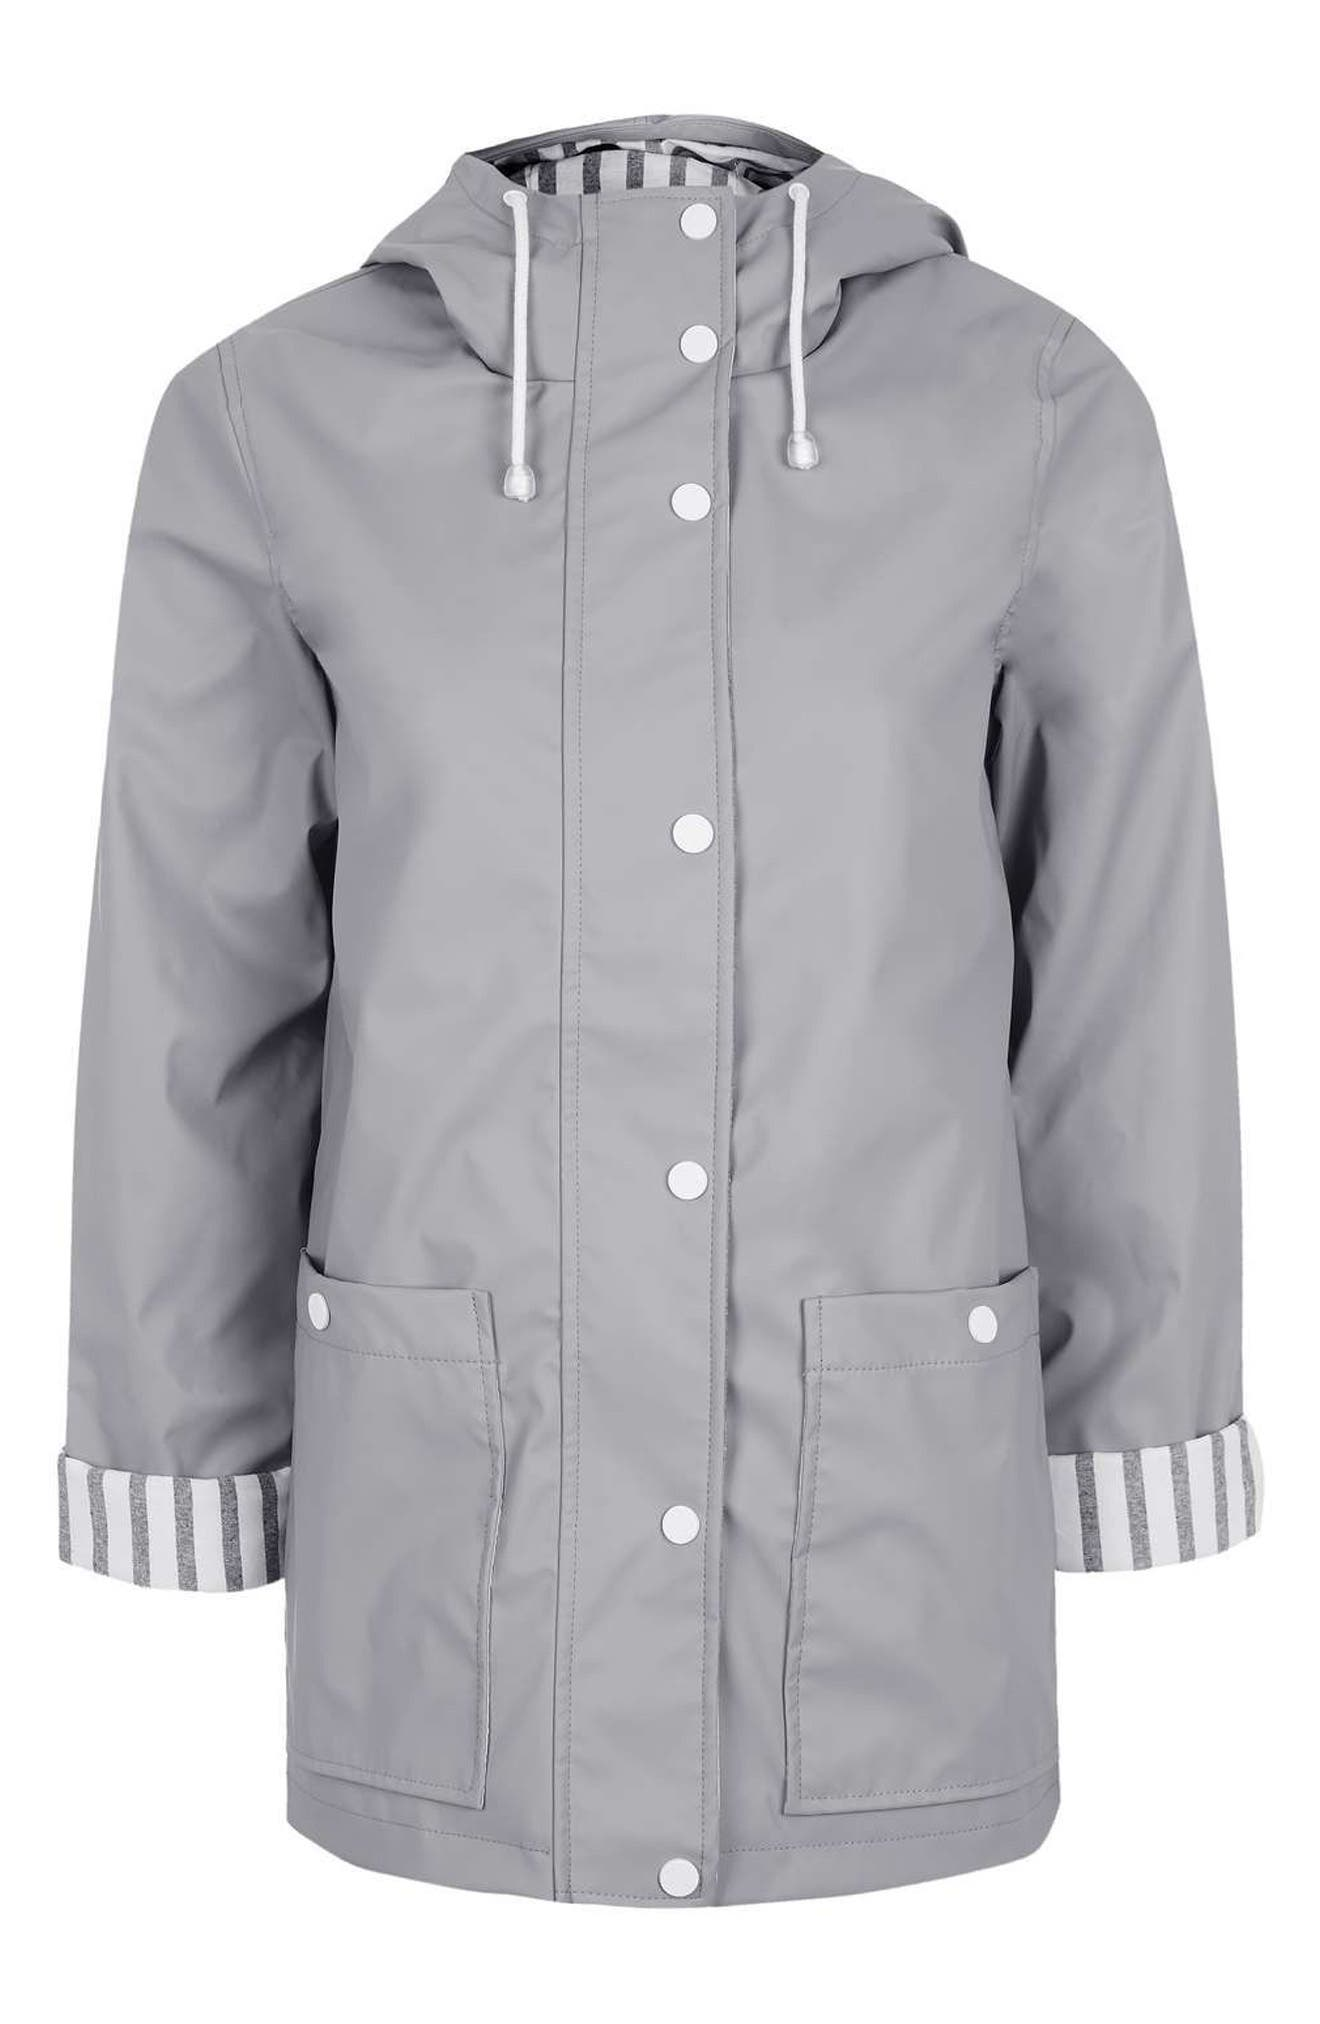 Maisie Rain Jacket,                             Alternate thumbnail 6, color,                             Grey Multi